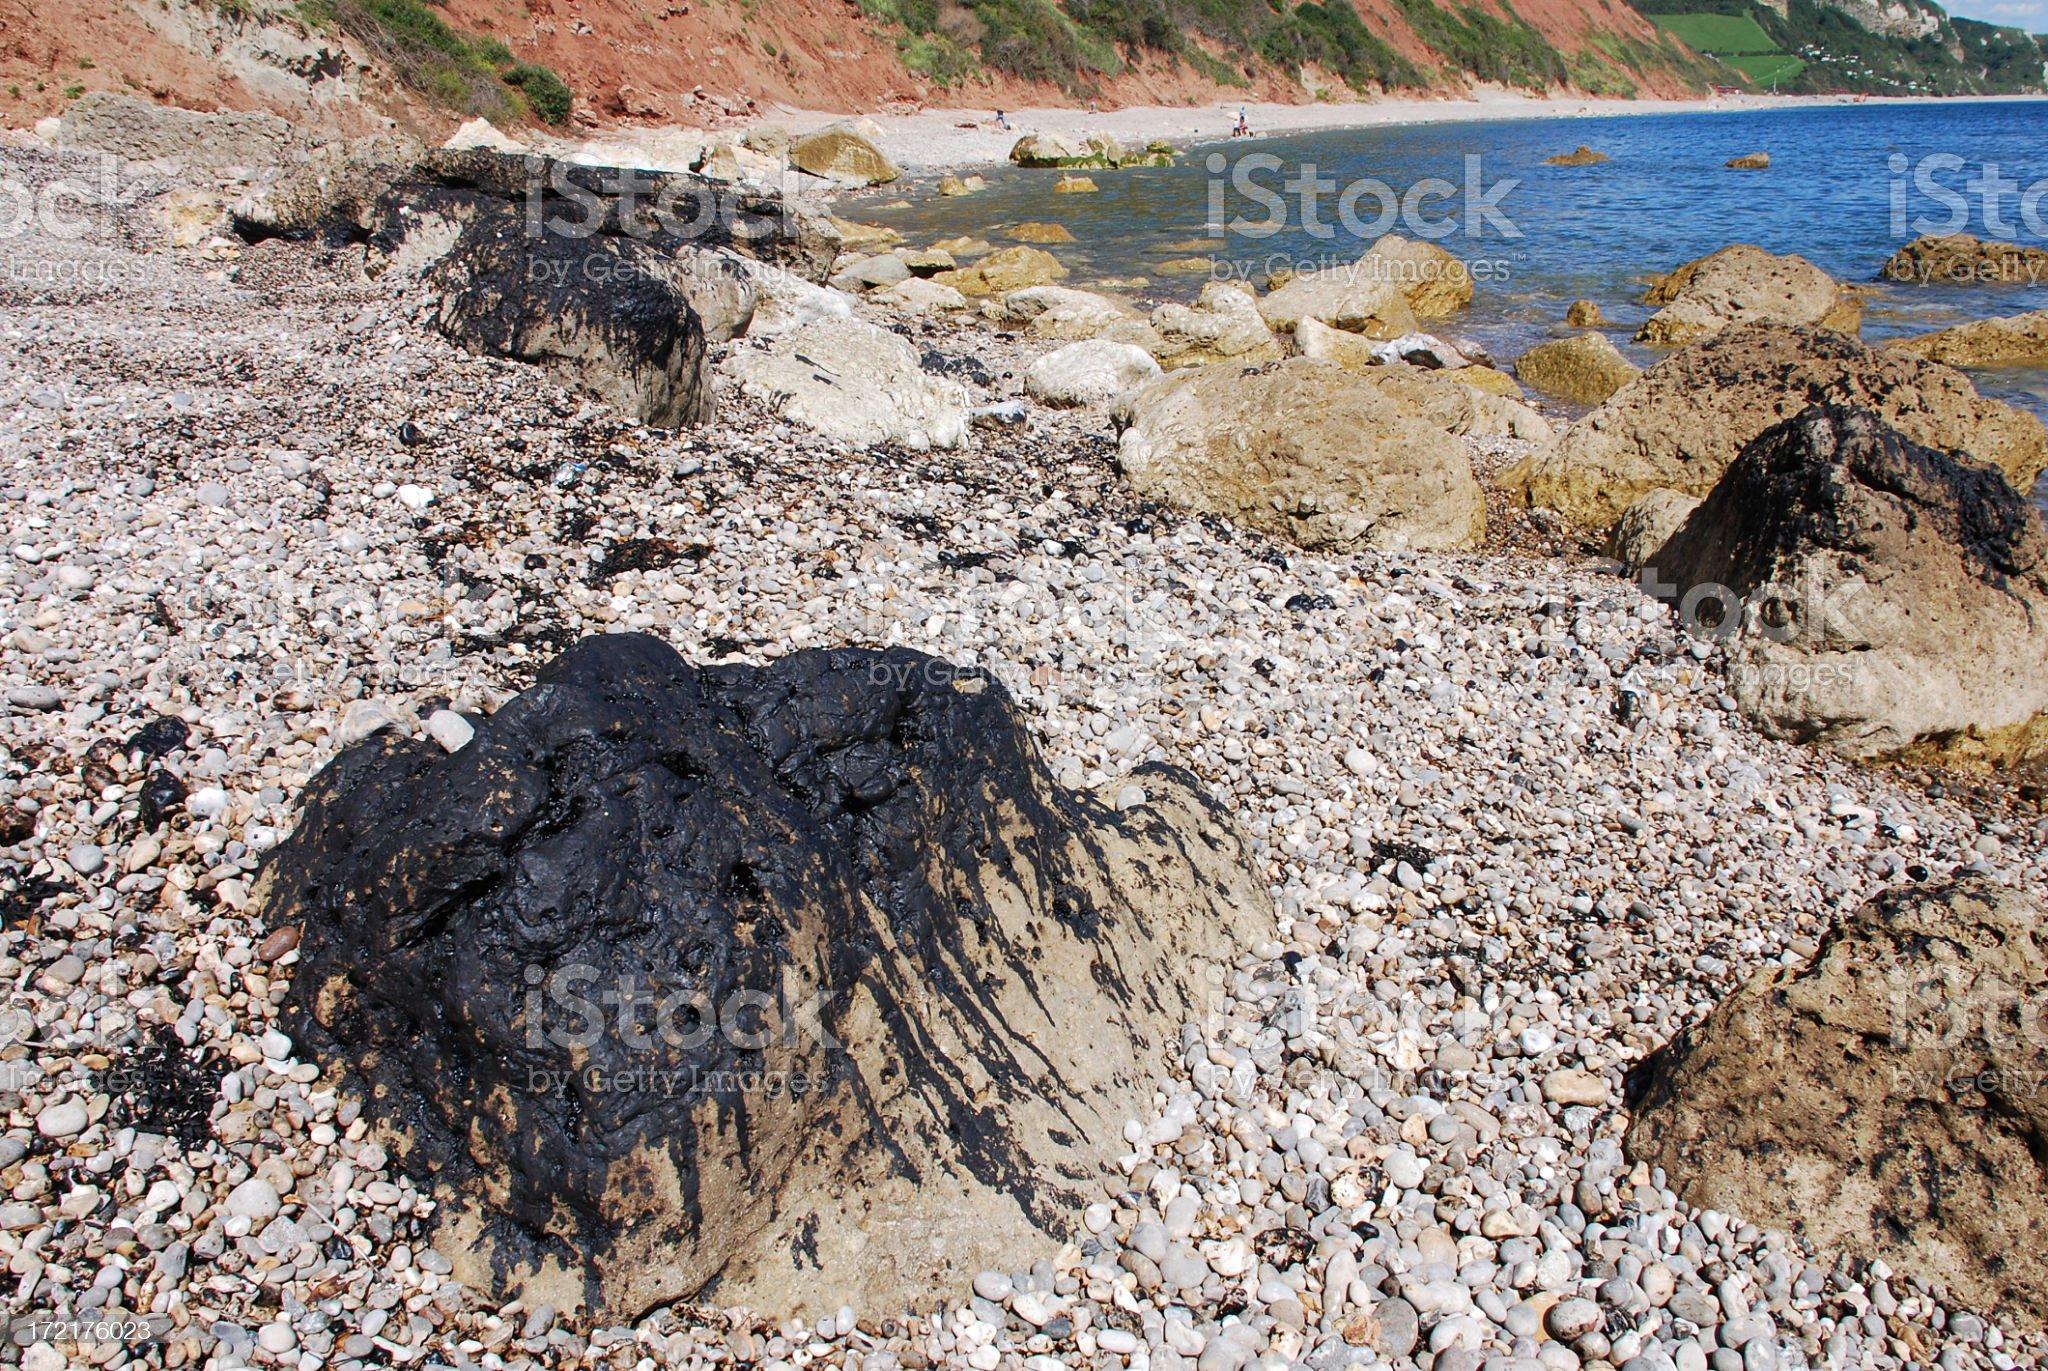 Oil Spill on Coast royalty-free stock photo